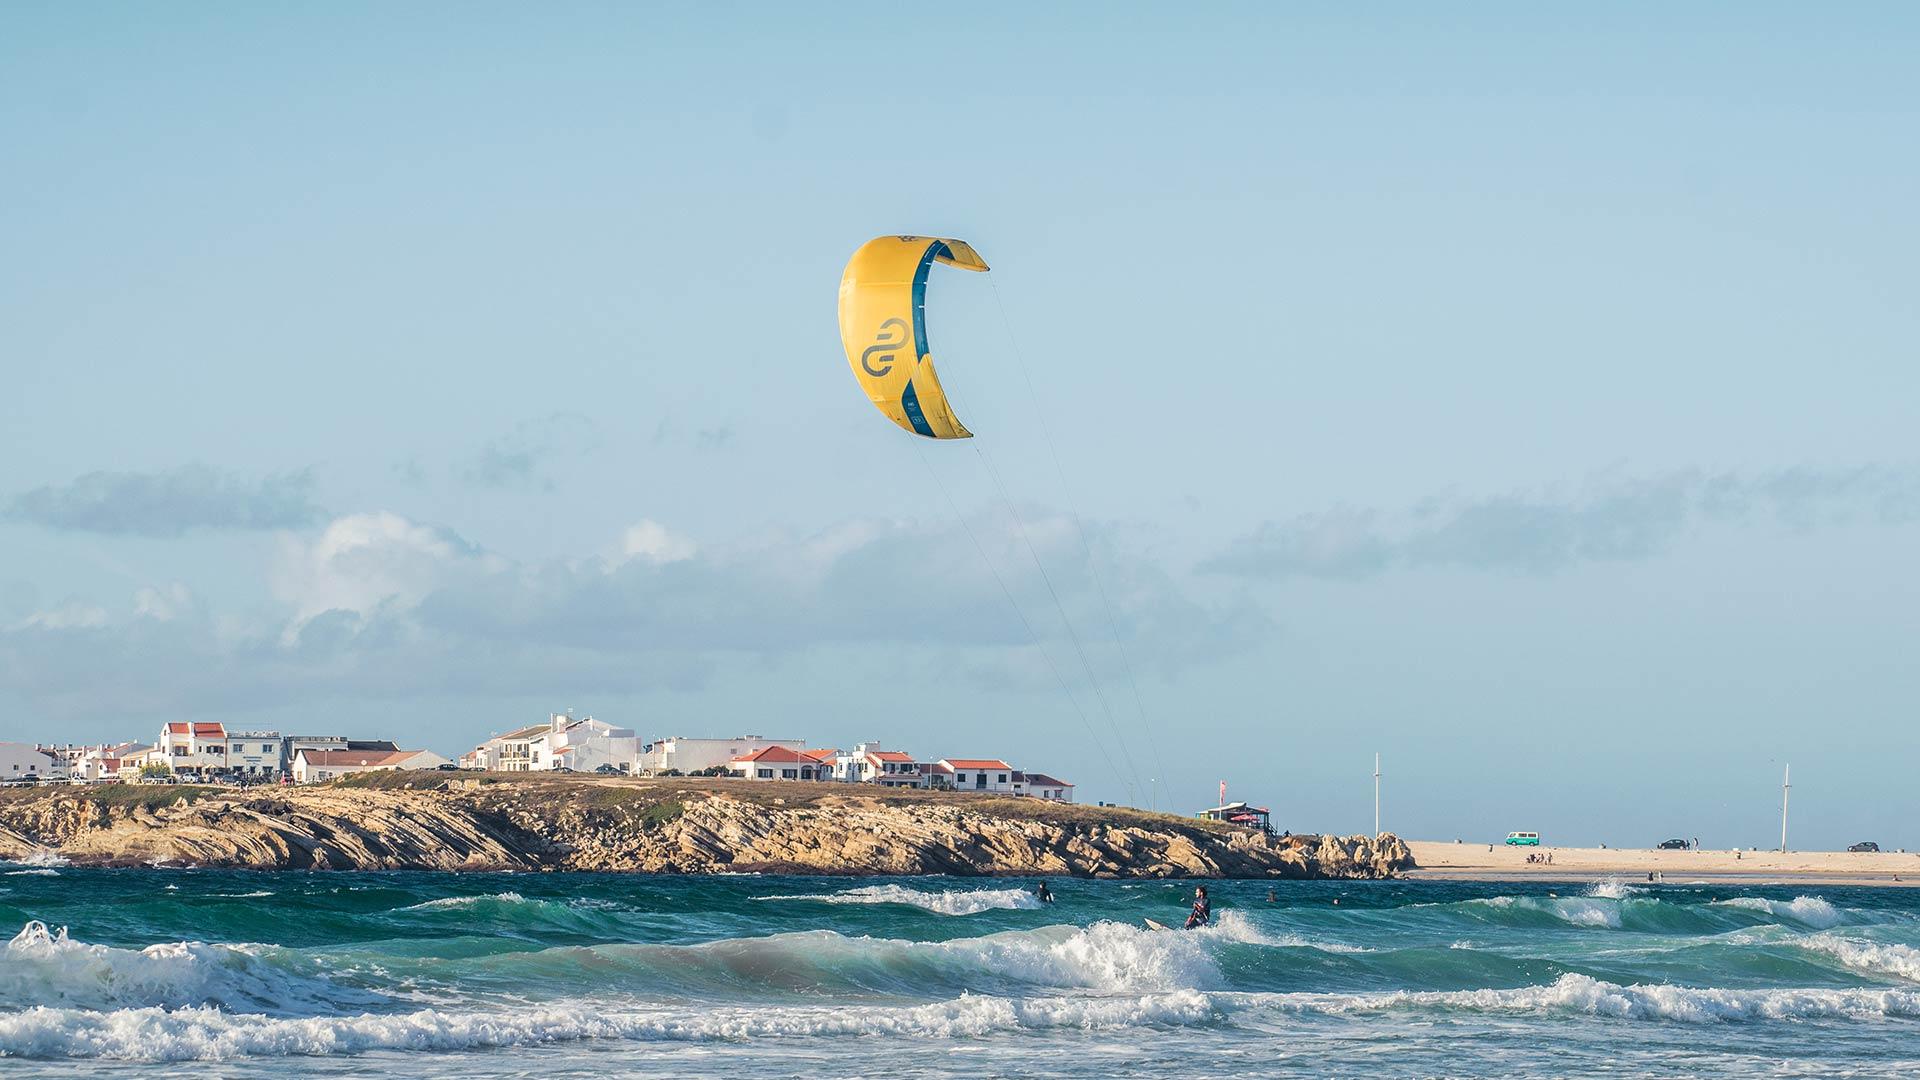 surfers lodge kite-surf activity